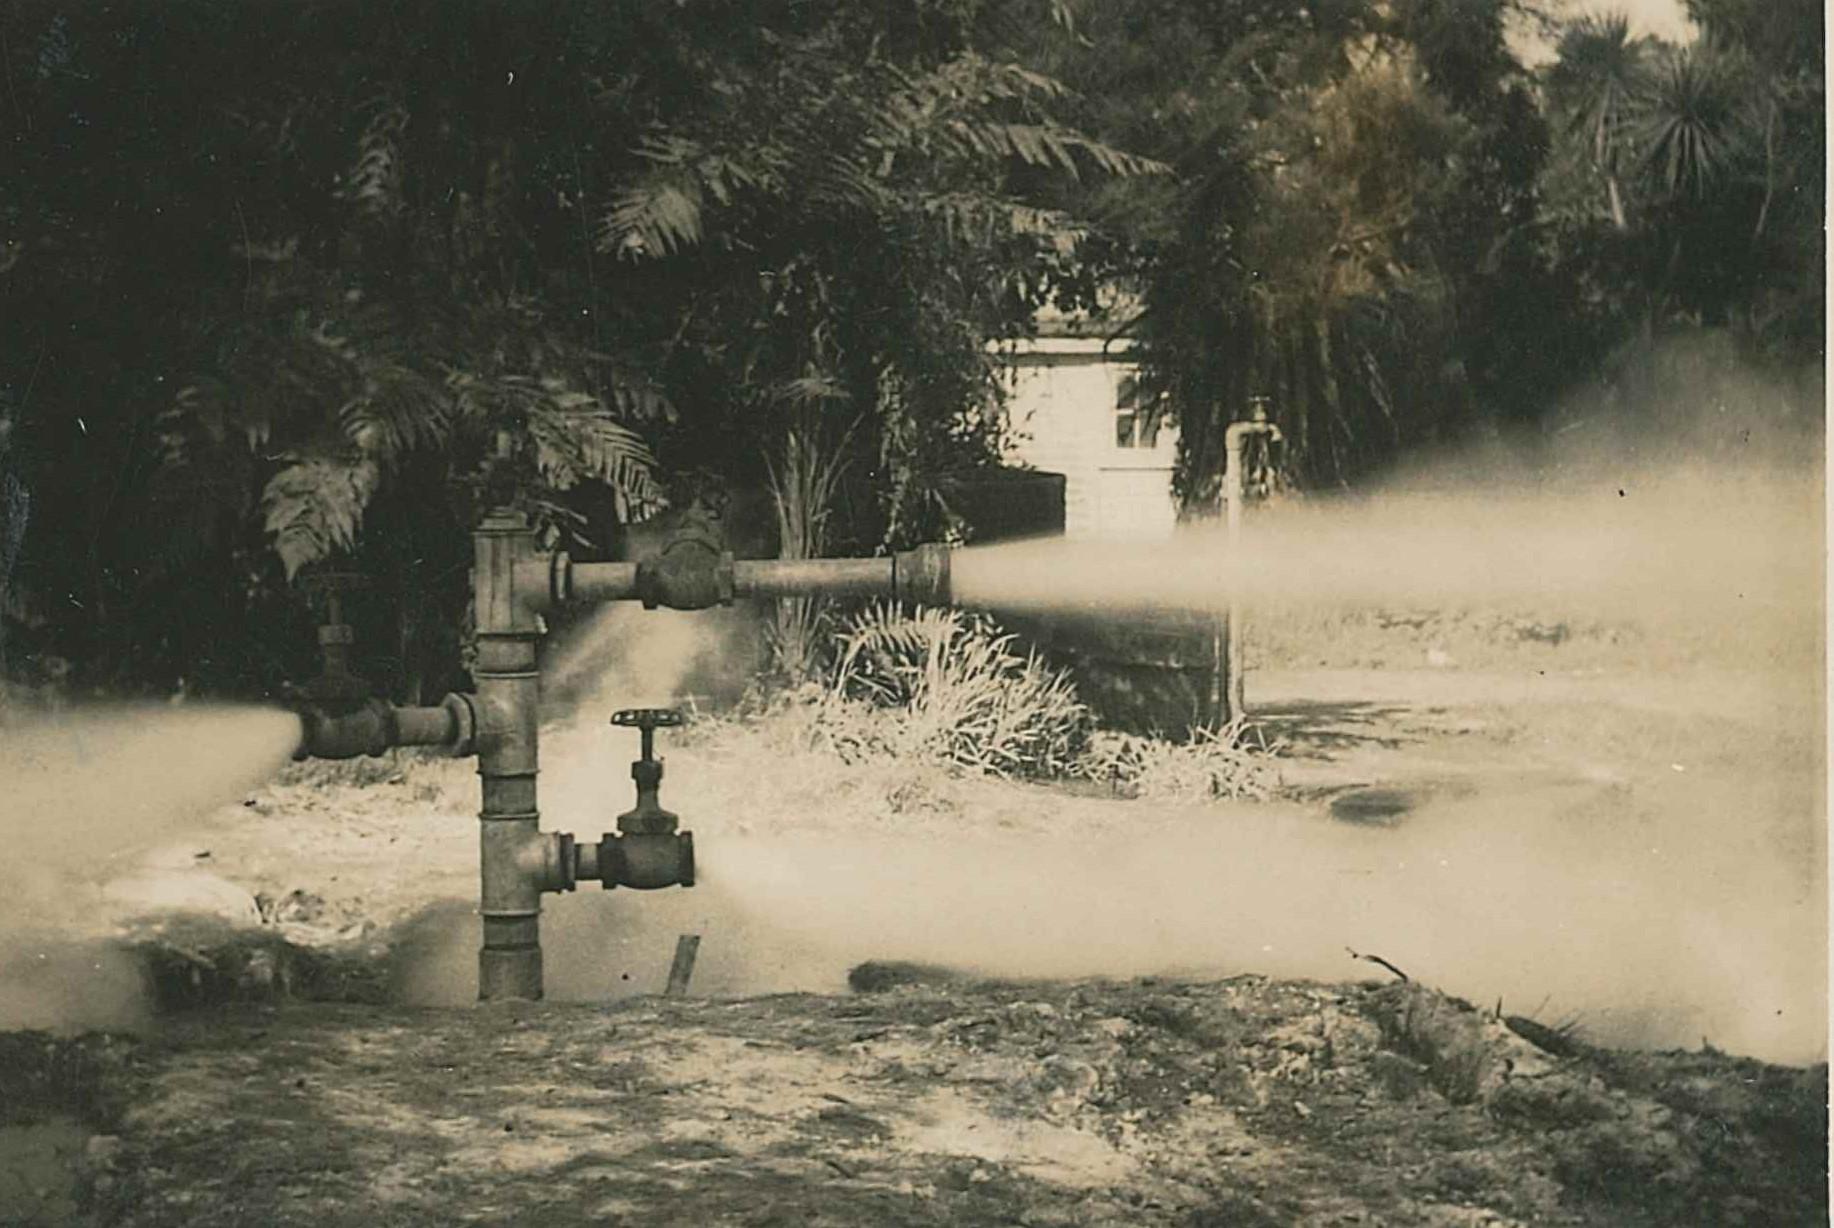 Doug Chase steam